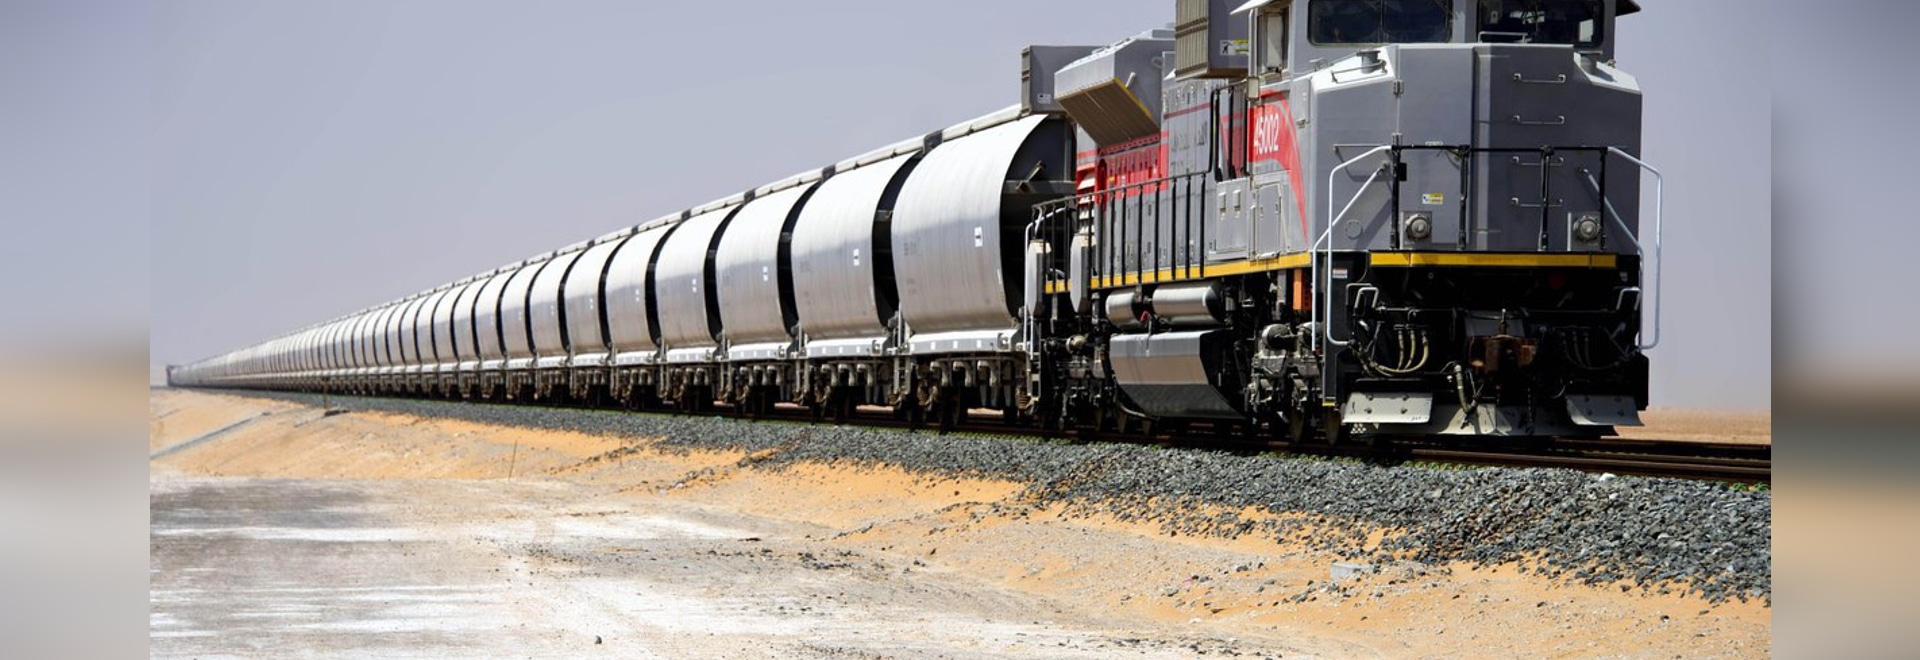 Etihad Railway project - I-MAK